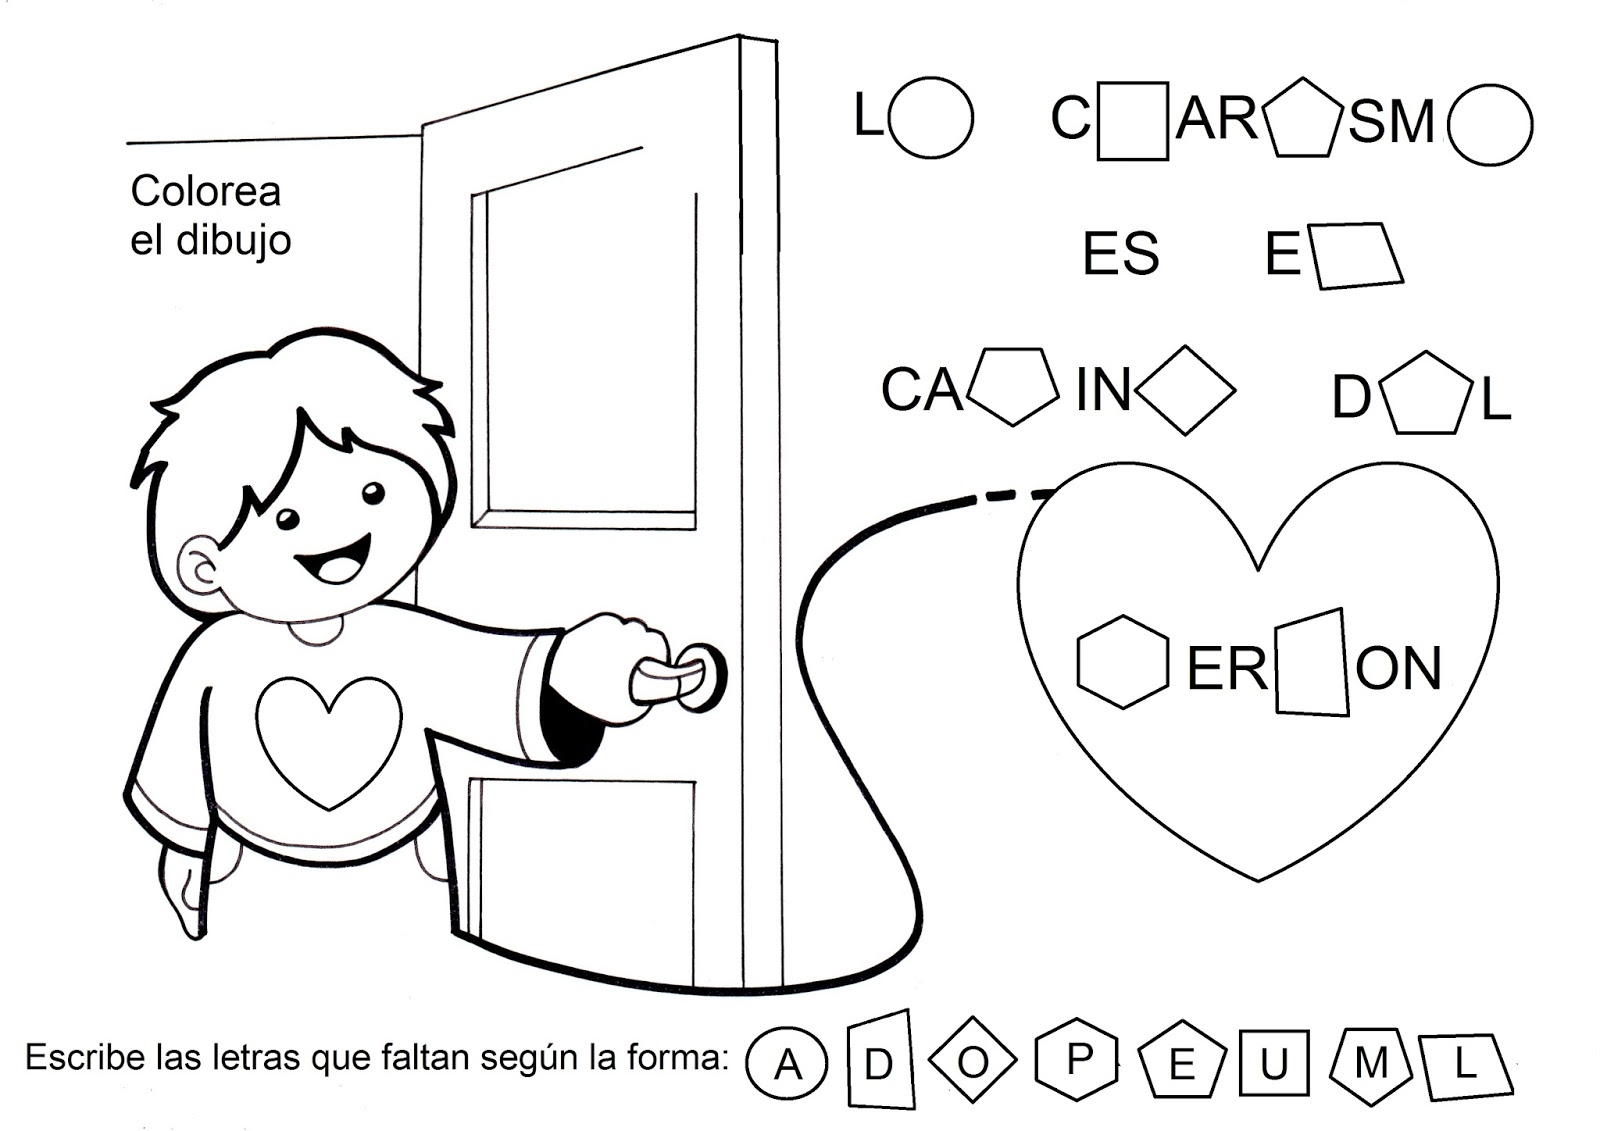 Encantador Ceniza Para Colorear Embellecimiento - Dibujos Para ...